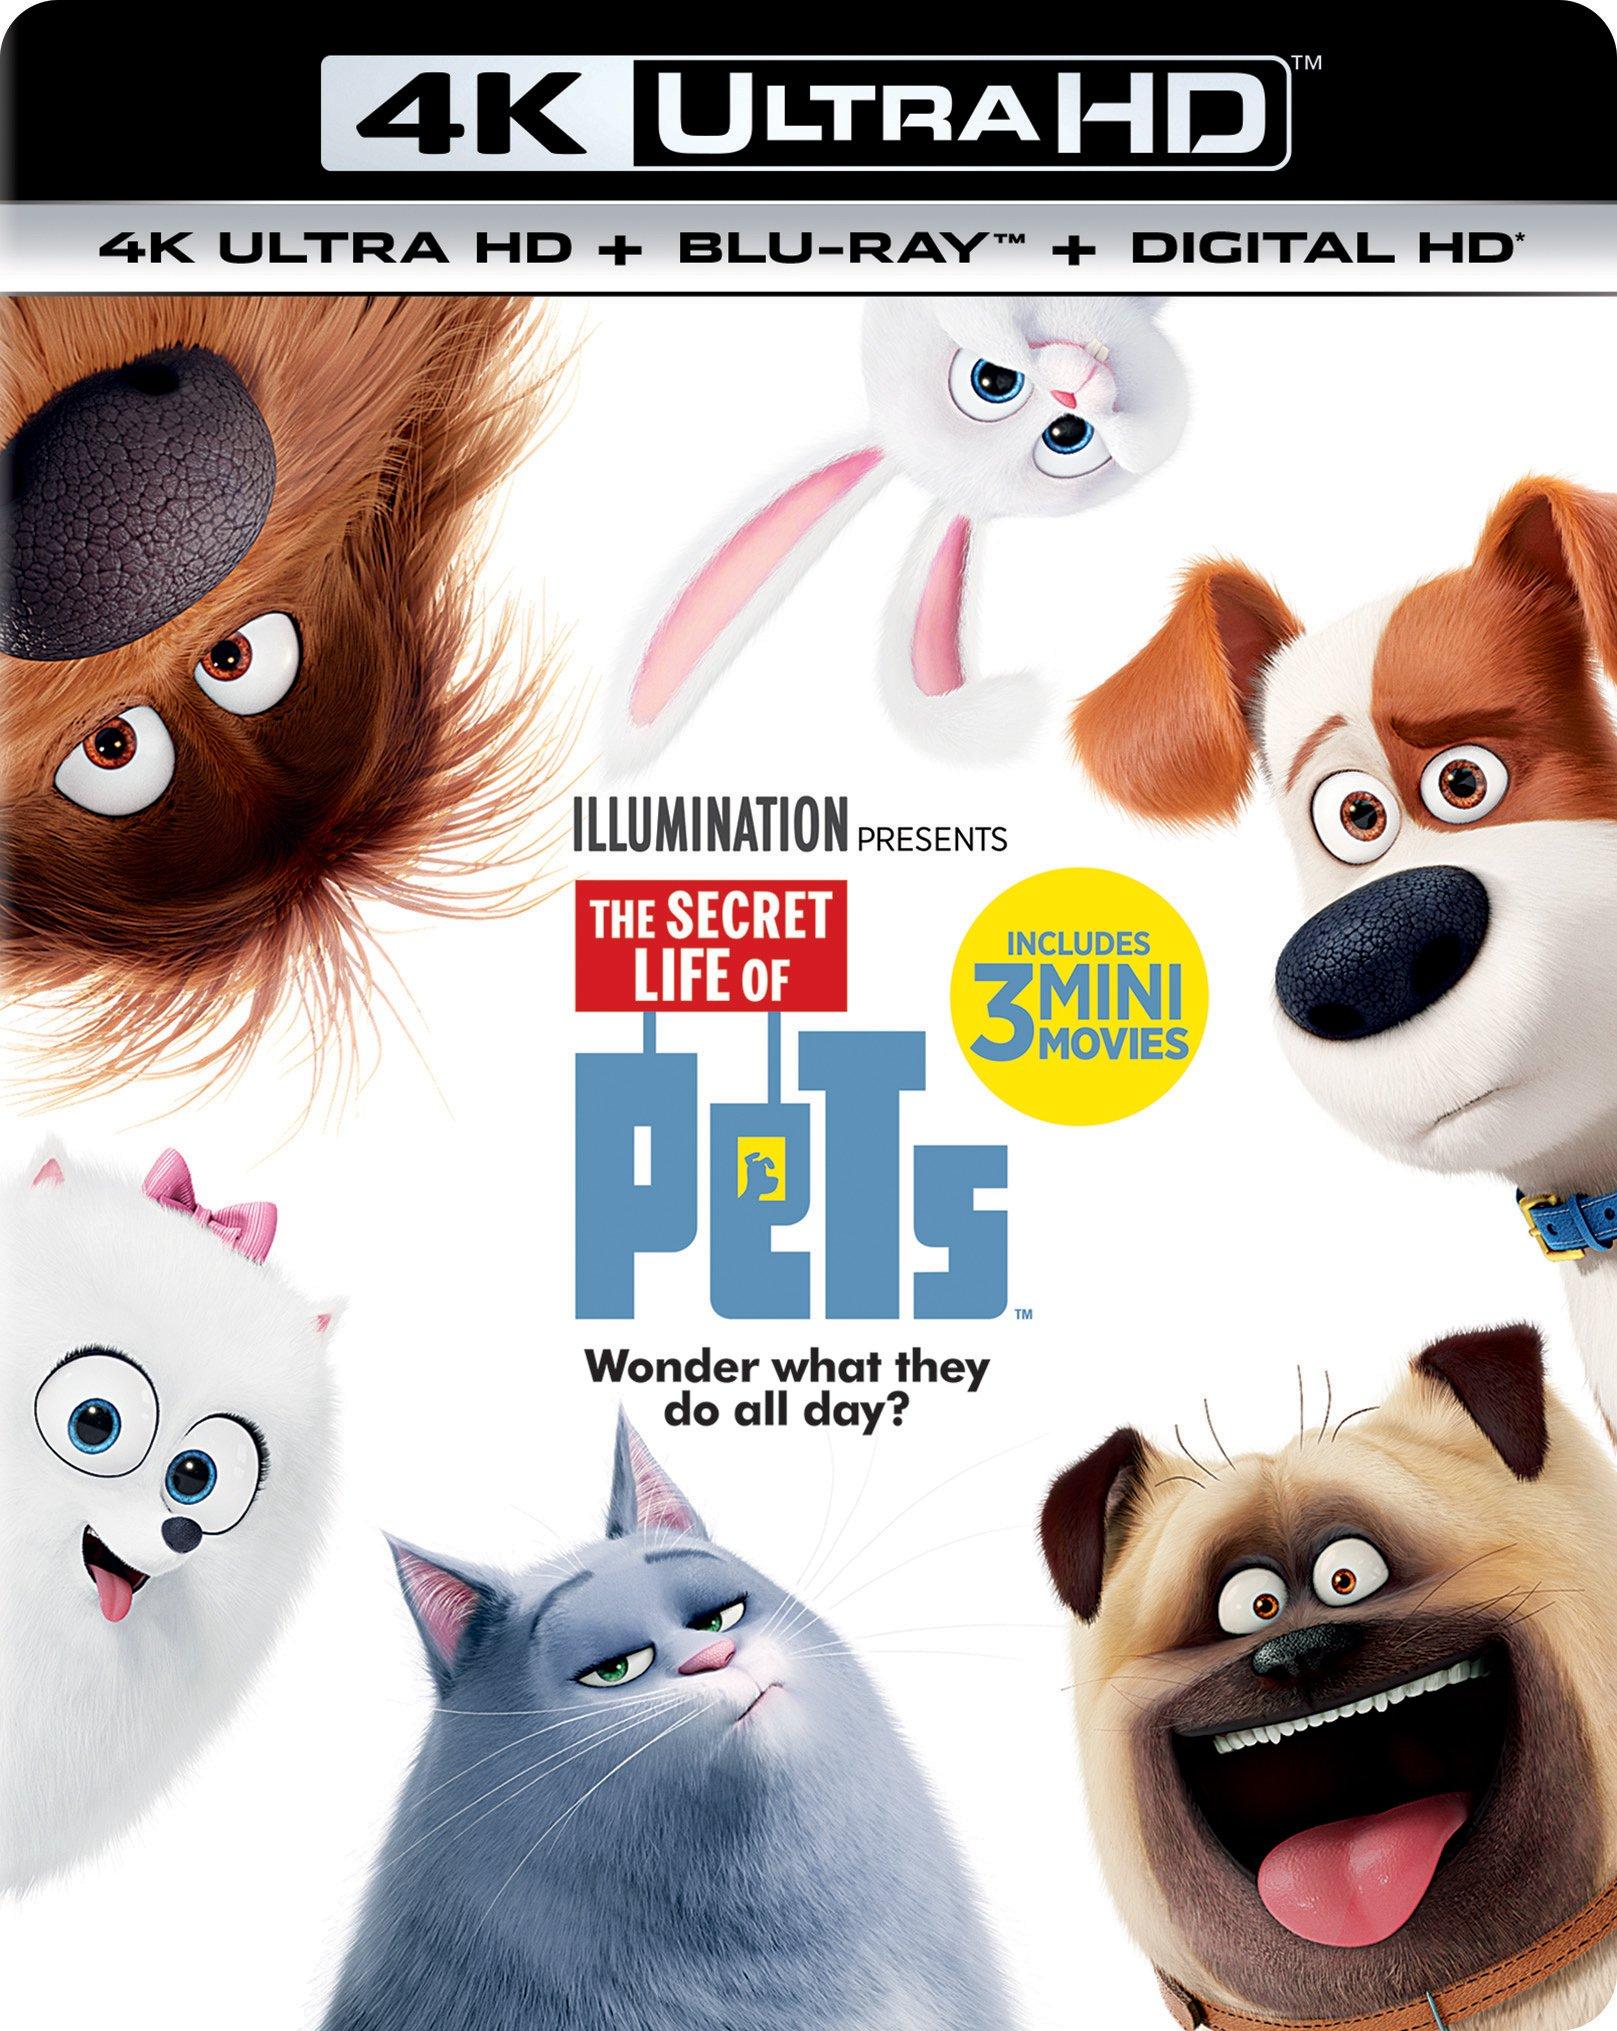 4K Blu-ray : The Secret Life Of Pets (With Blu-Ray, 4K Mastering, Ultraviolet Digital Copy, Digitally Mastered in HD, Digital Copy)